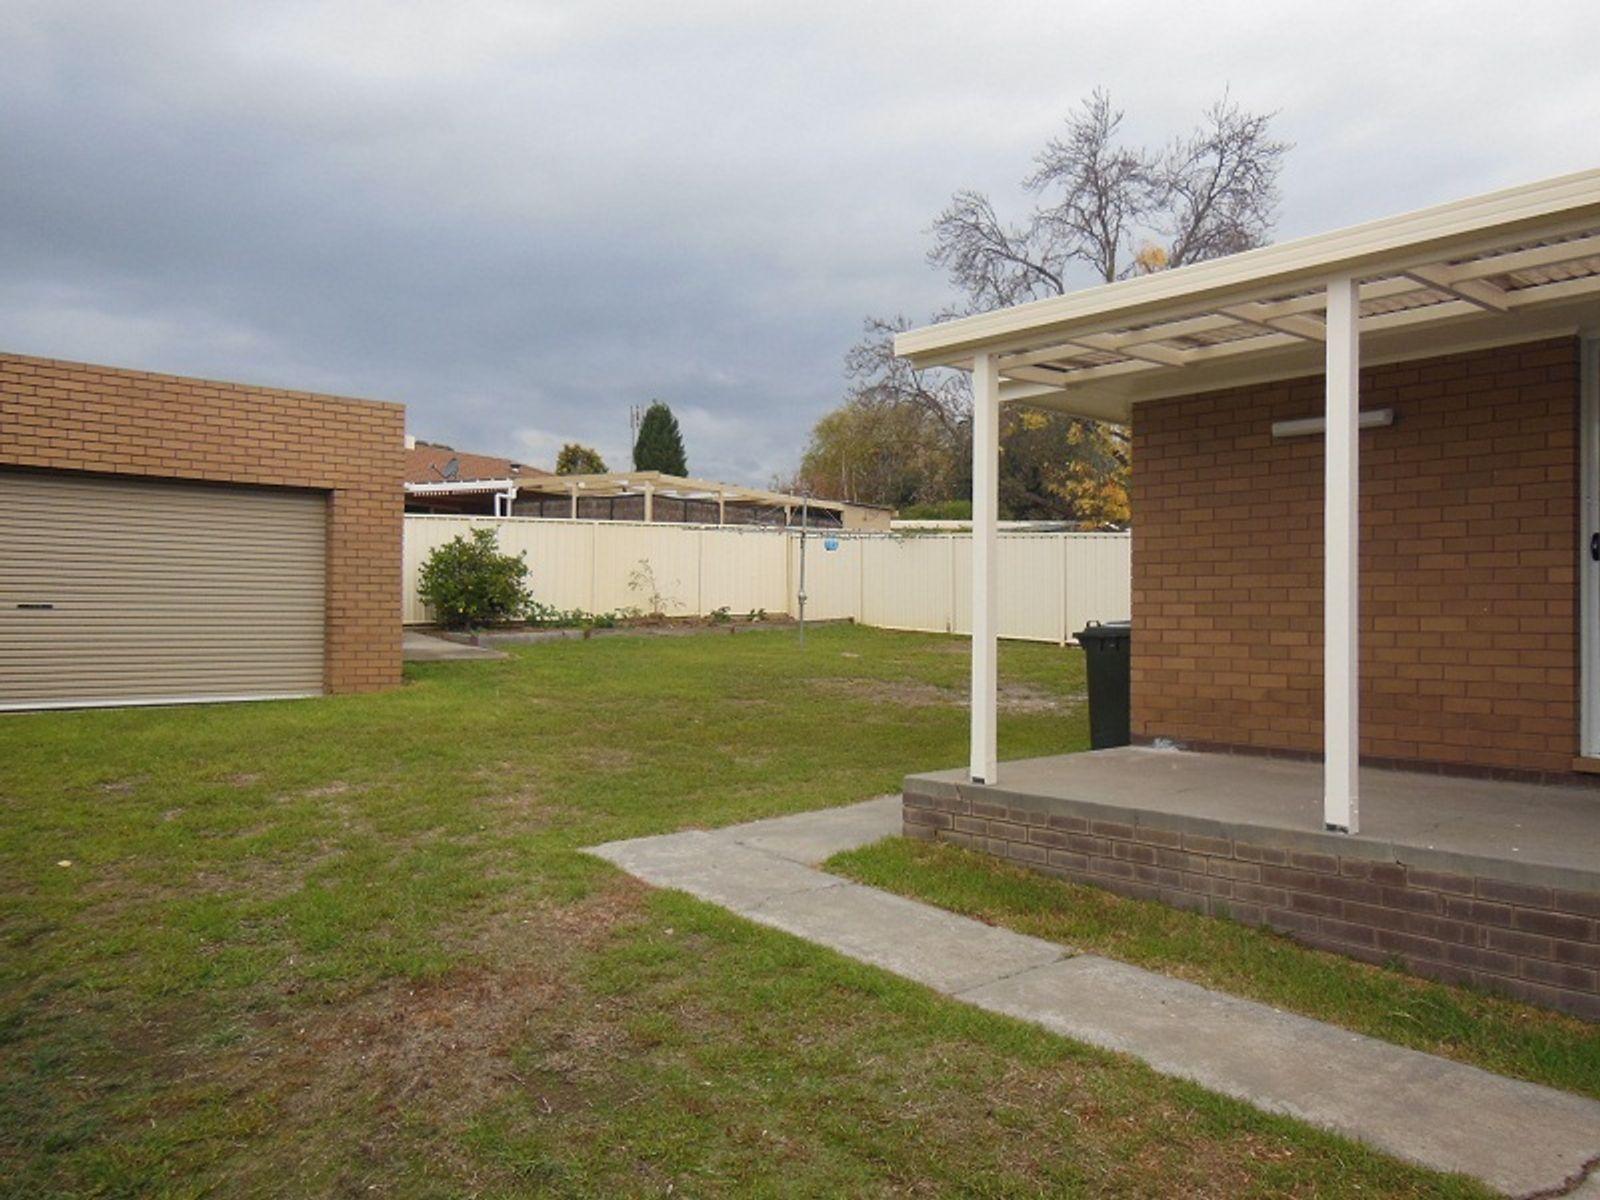 151 Reservoir Road, Strathdale, VIC 3550